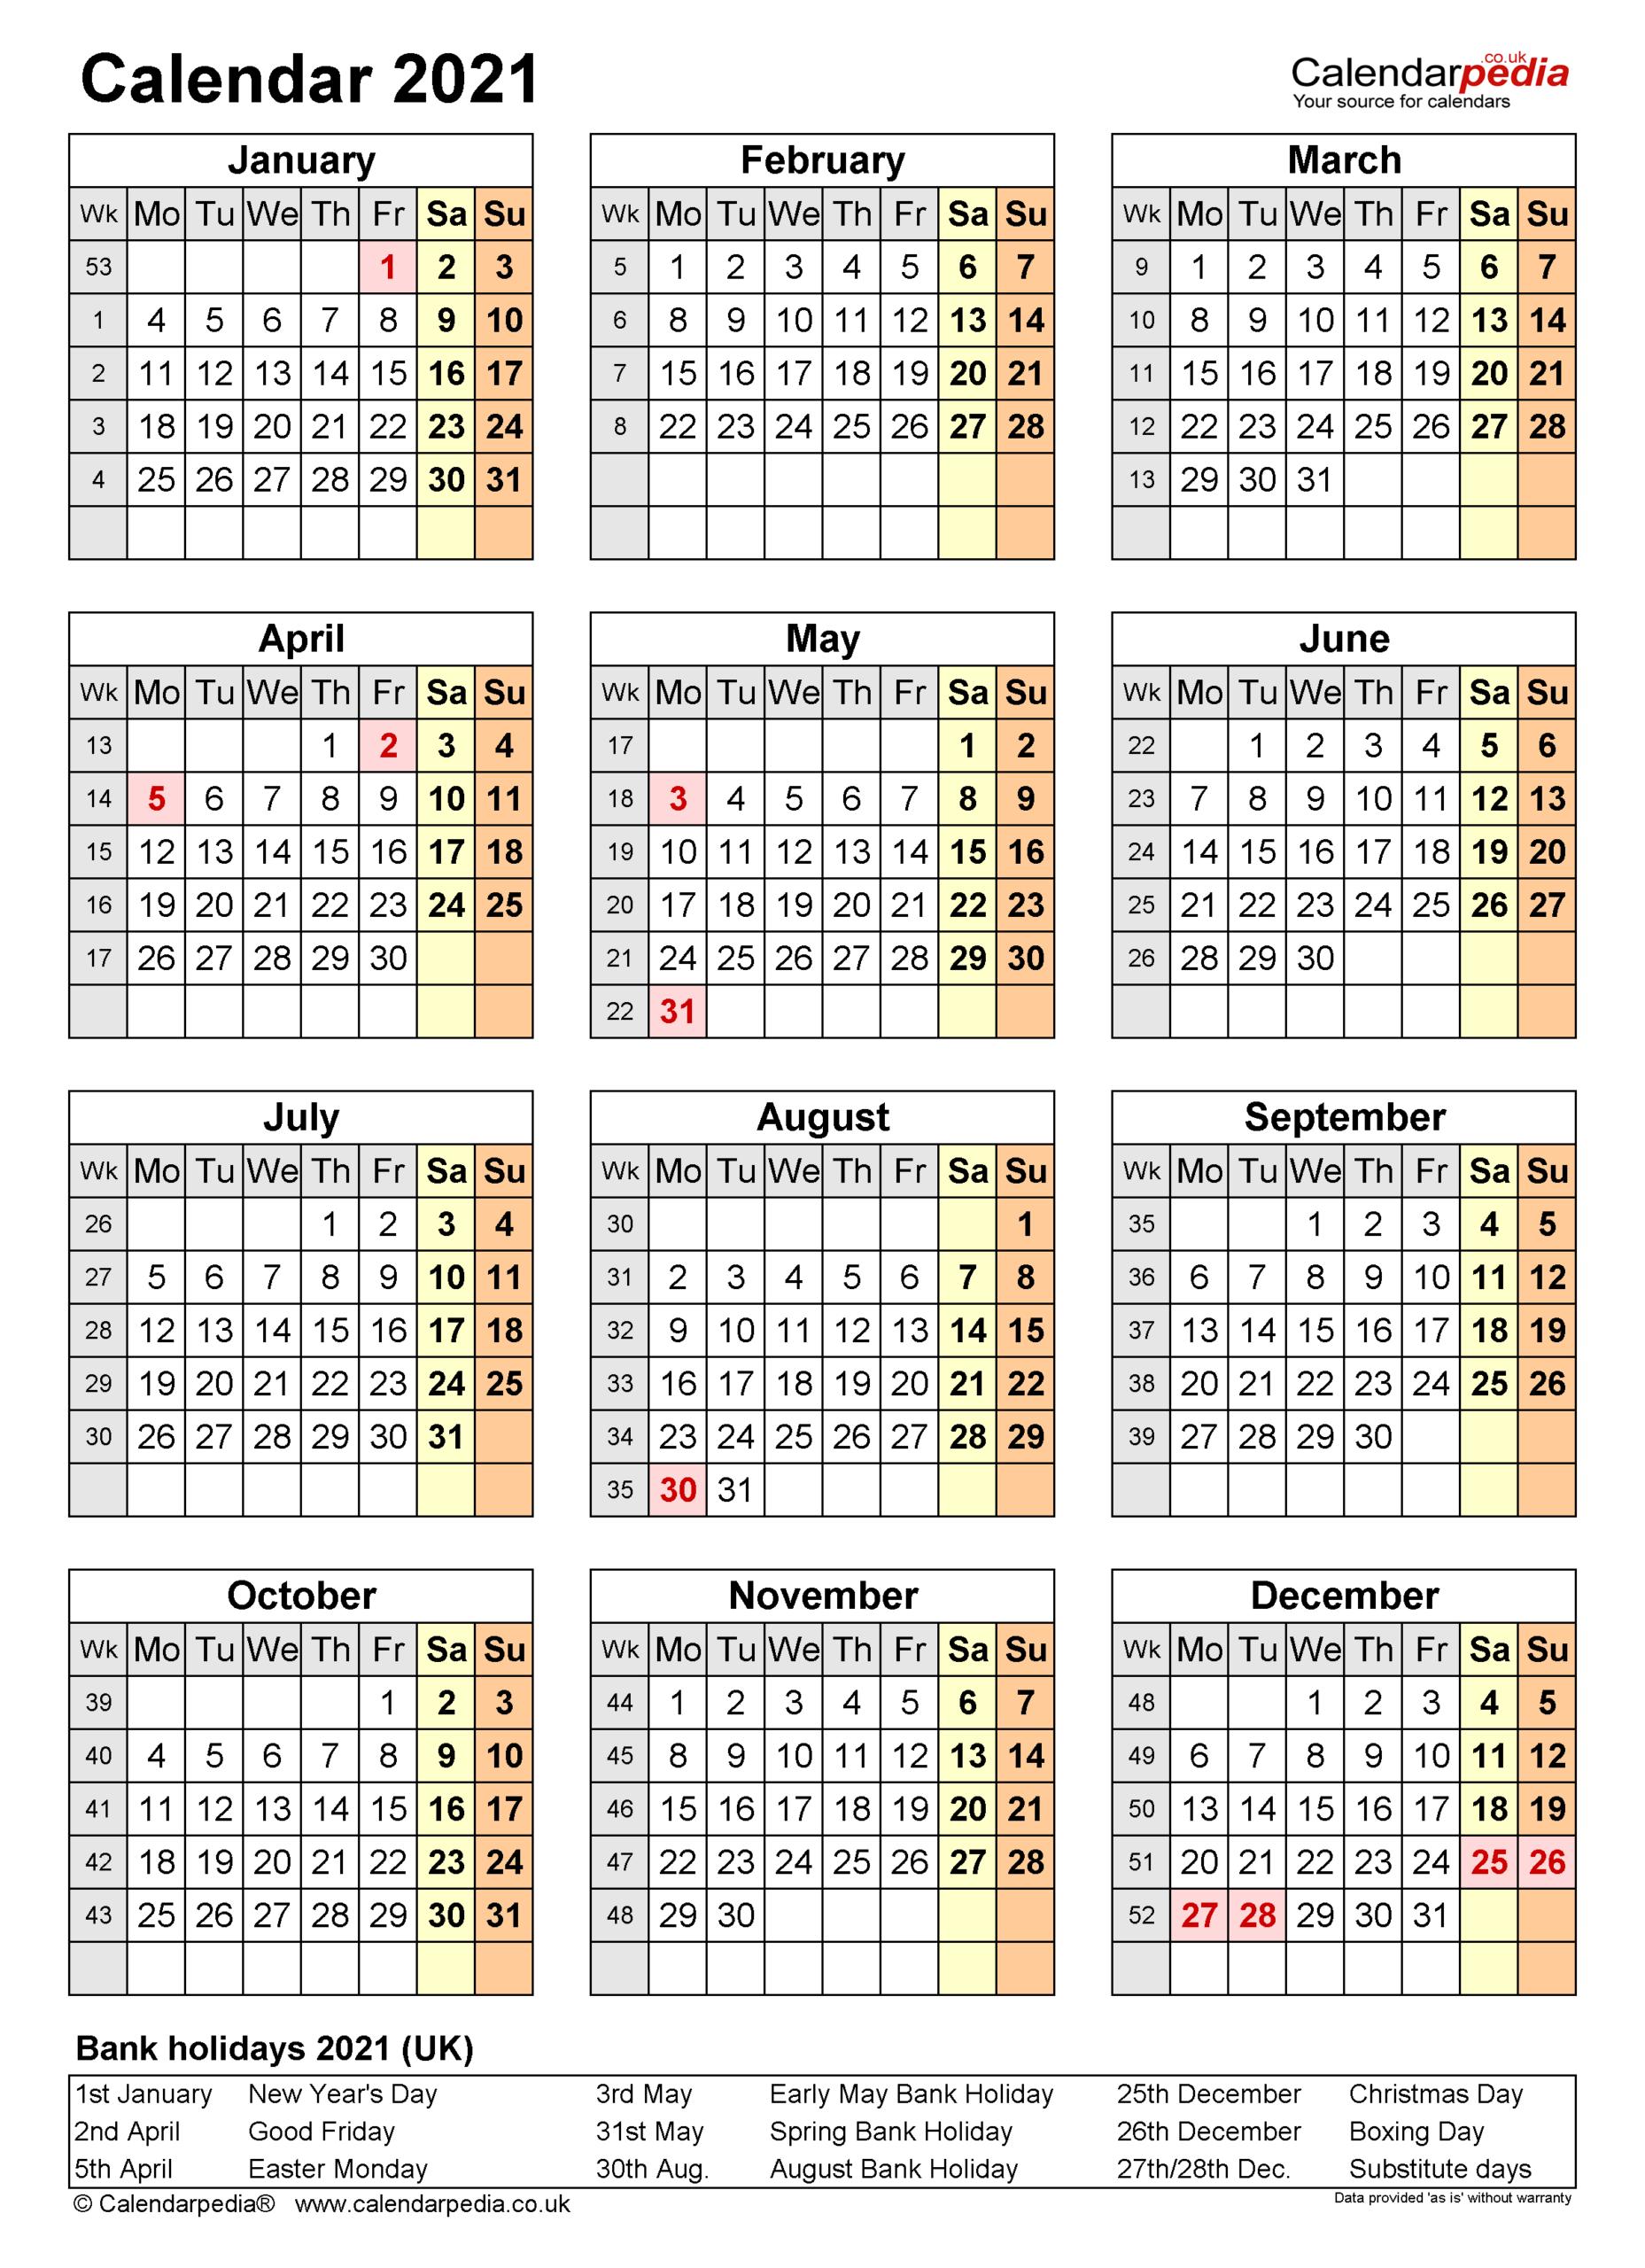 Calendar 2021 (Uk) - Free Printable Pdf Templates pertaining to Pocket Calendar 2021-2021: Two Year